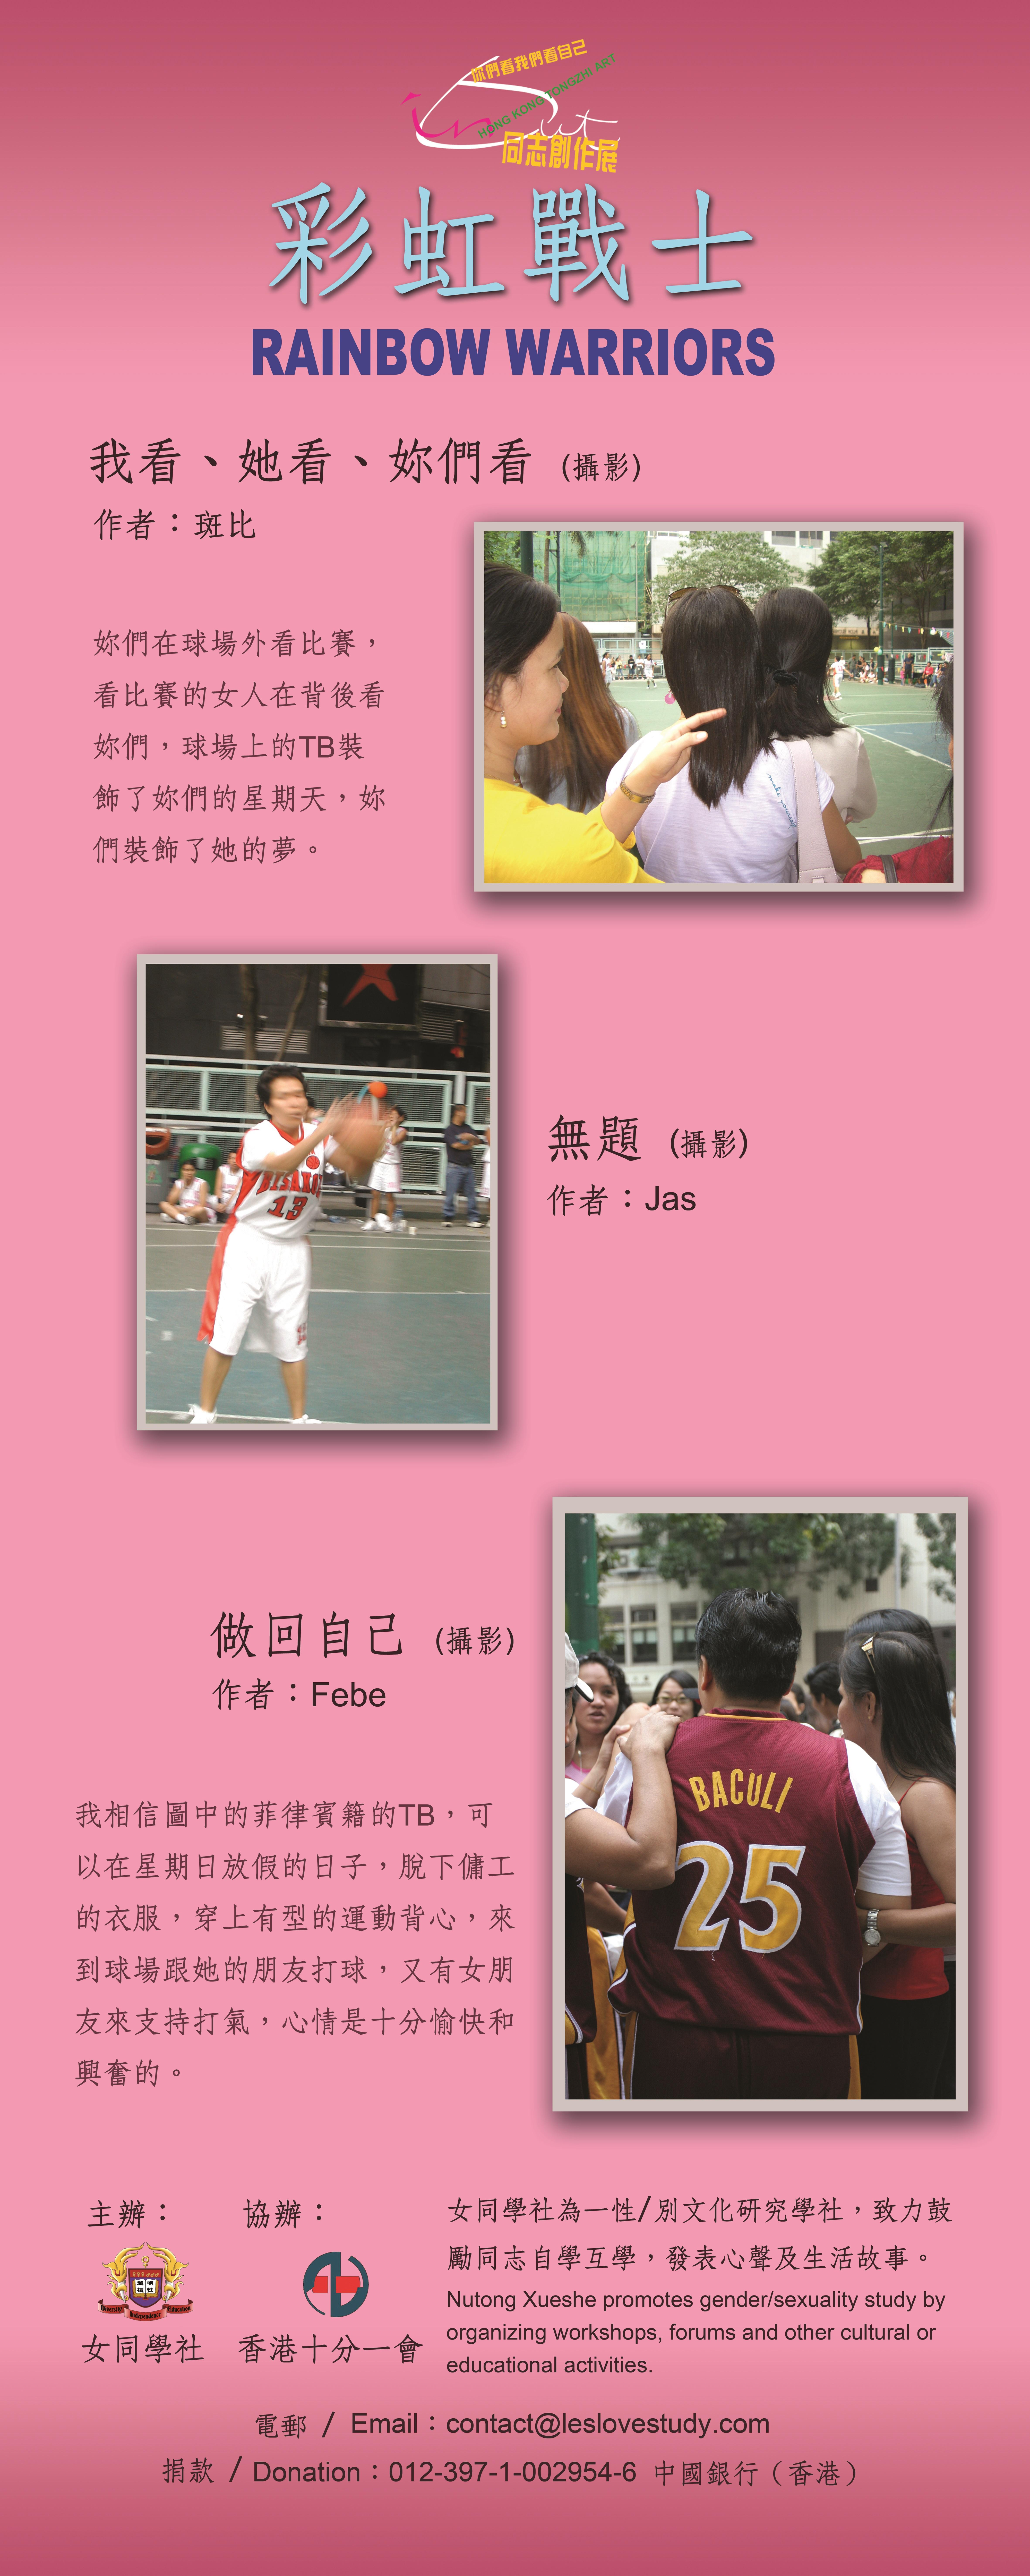 "Exhibit panel 2 for ""In/Out: 1st Hong Kong Tongzhi Art Exhibition"", Nutong Xueshe, Hong Kong Cultural Center, 2007"